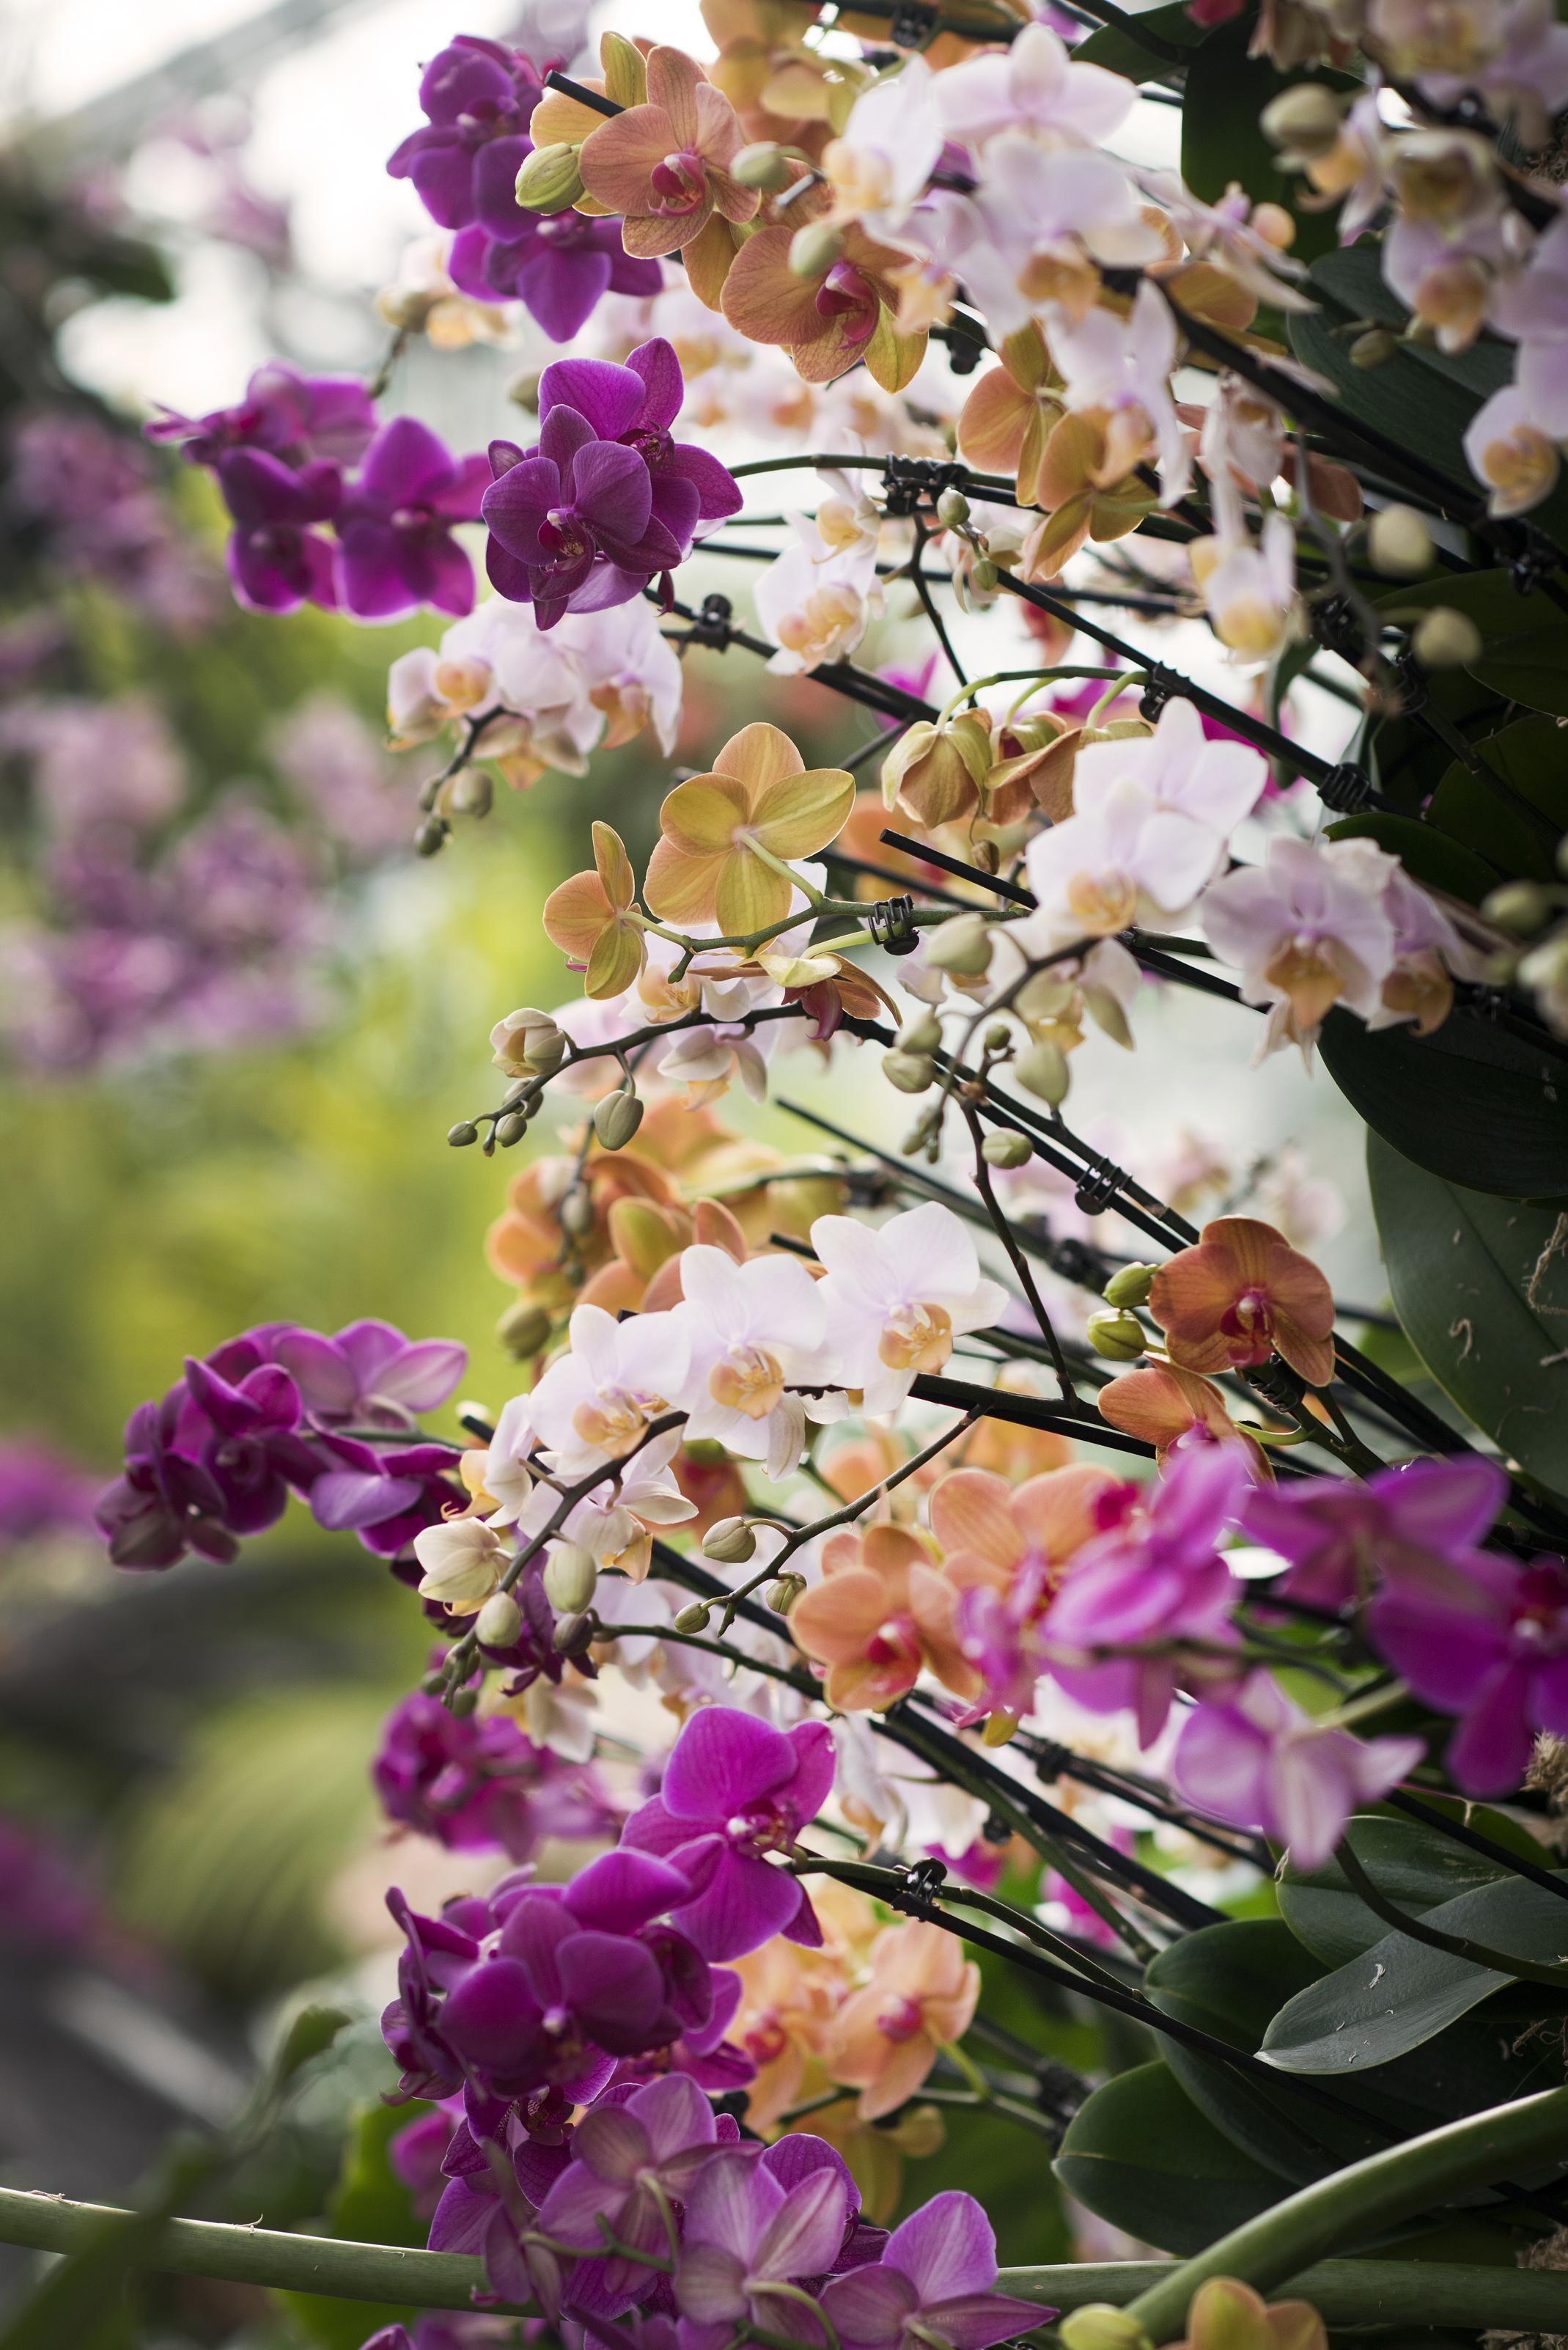 Orchid mania at Kew Gardens Orchid Festival (Jeff Eden/Royal Botanic Gardens Kew/PA)